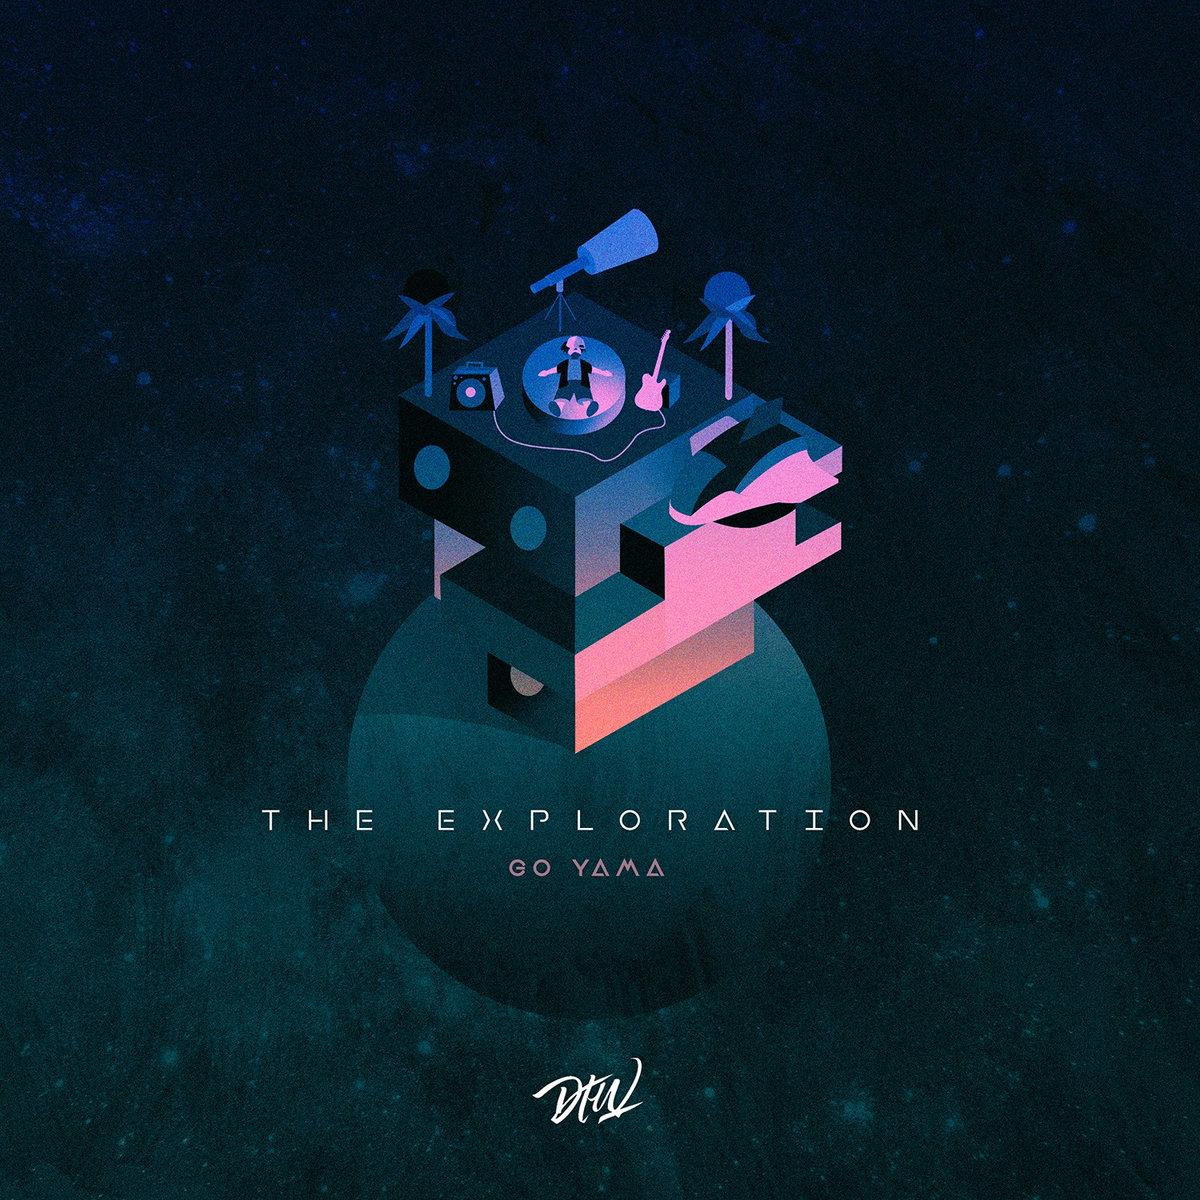 Go Yama - The Exploration